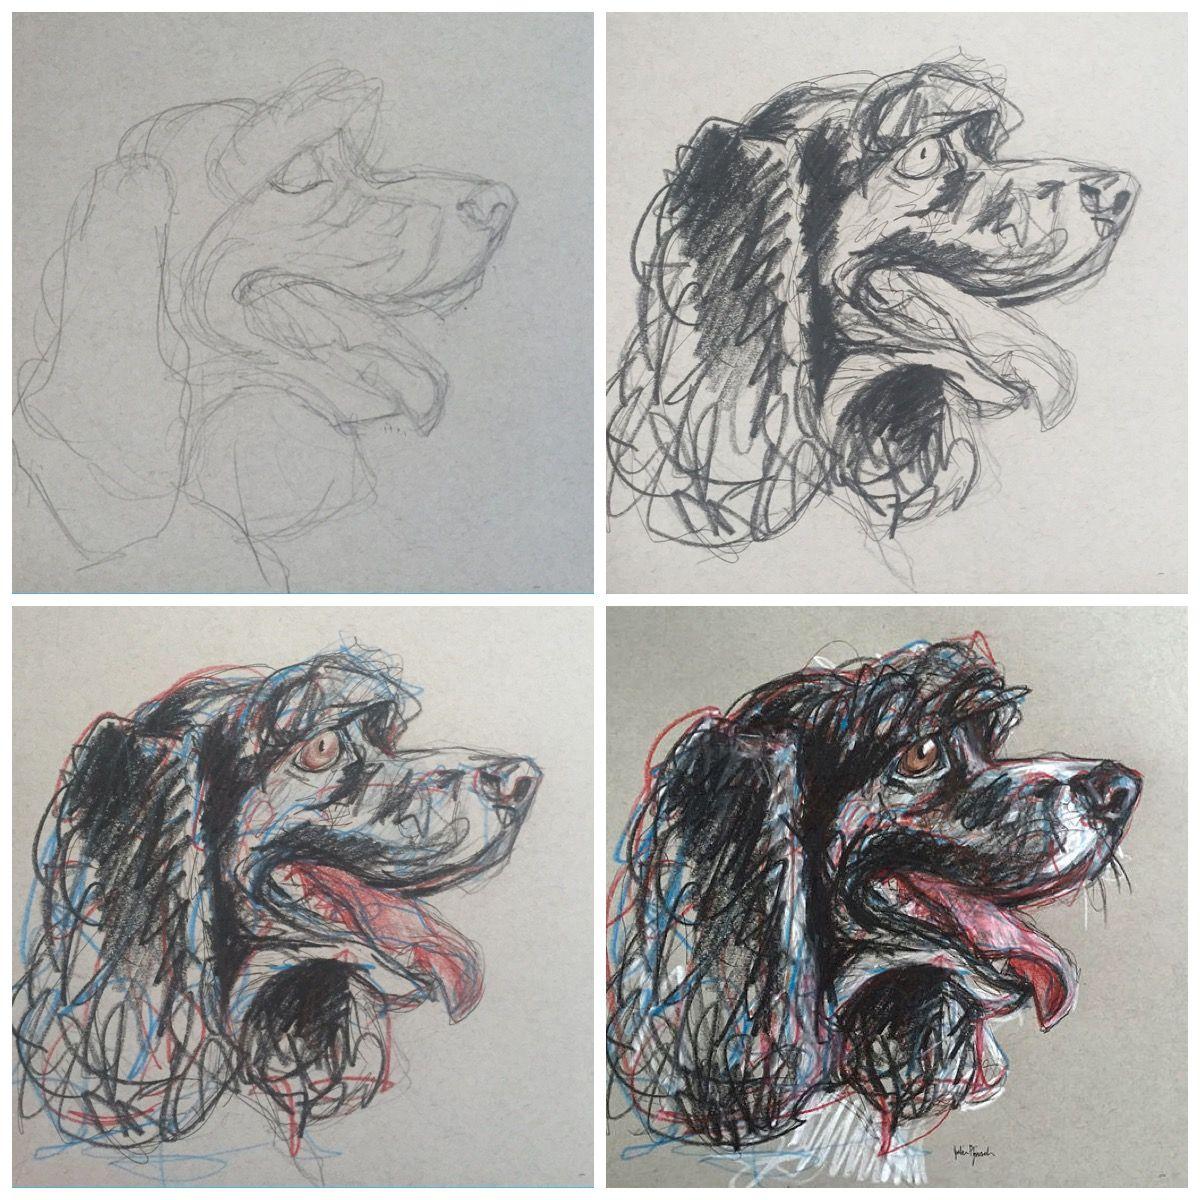 In progress photos of pet portrait sketch Pencil, pen and